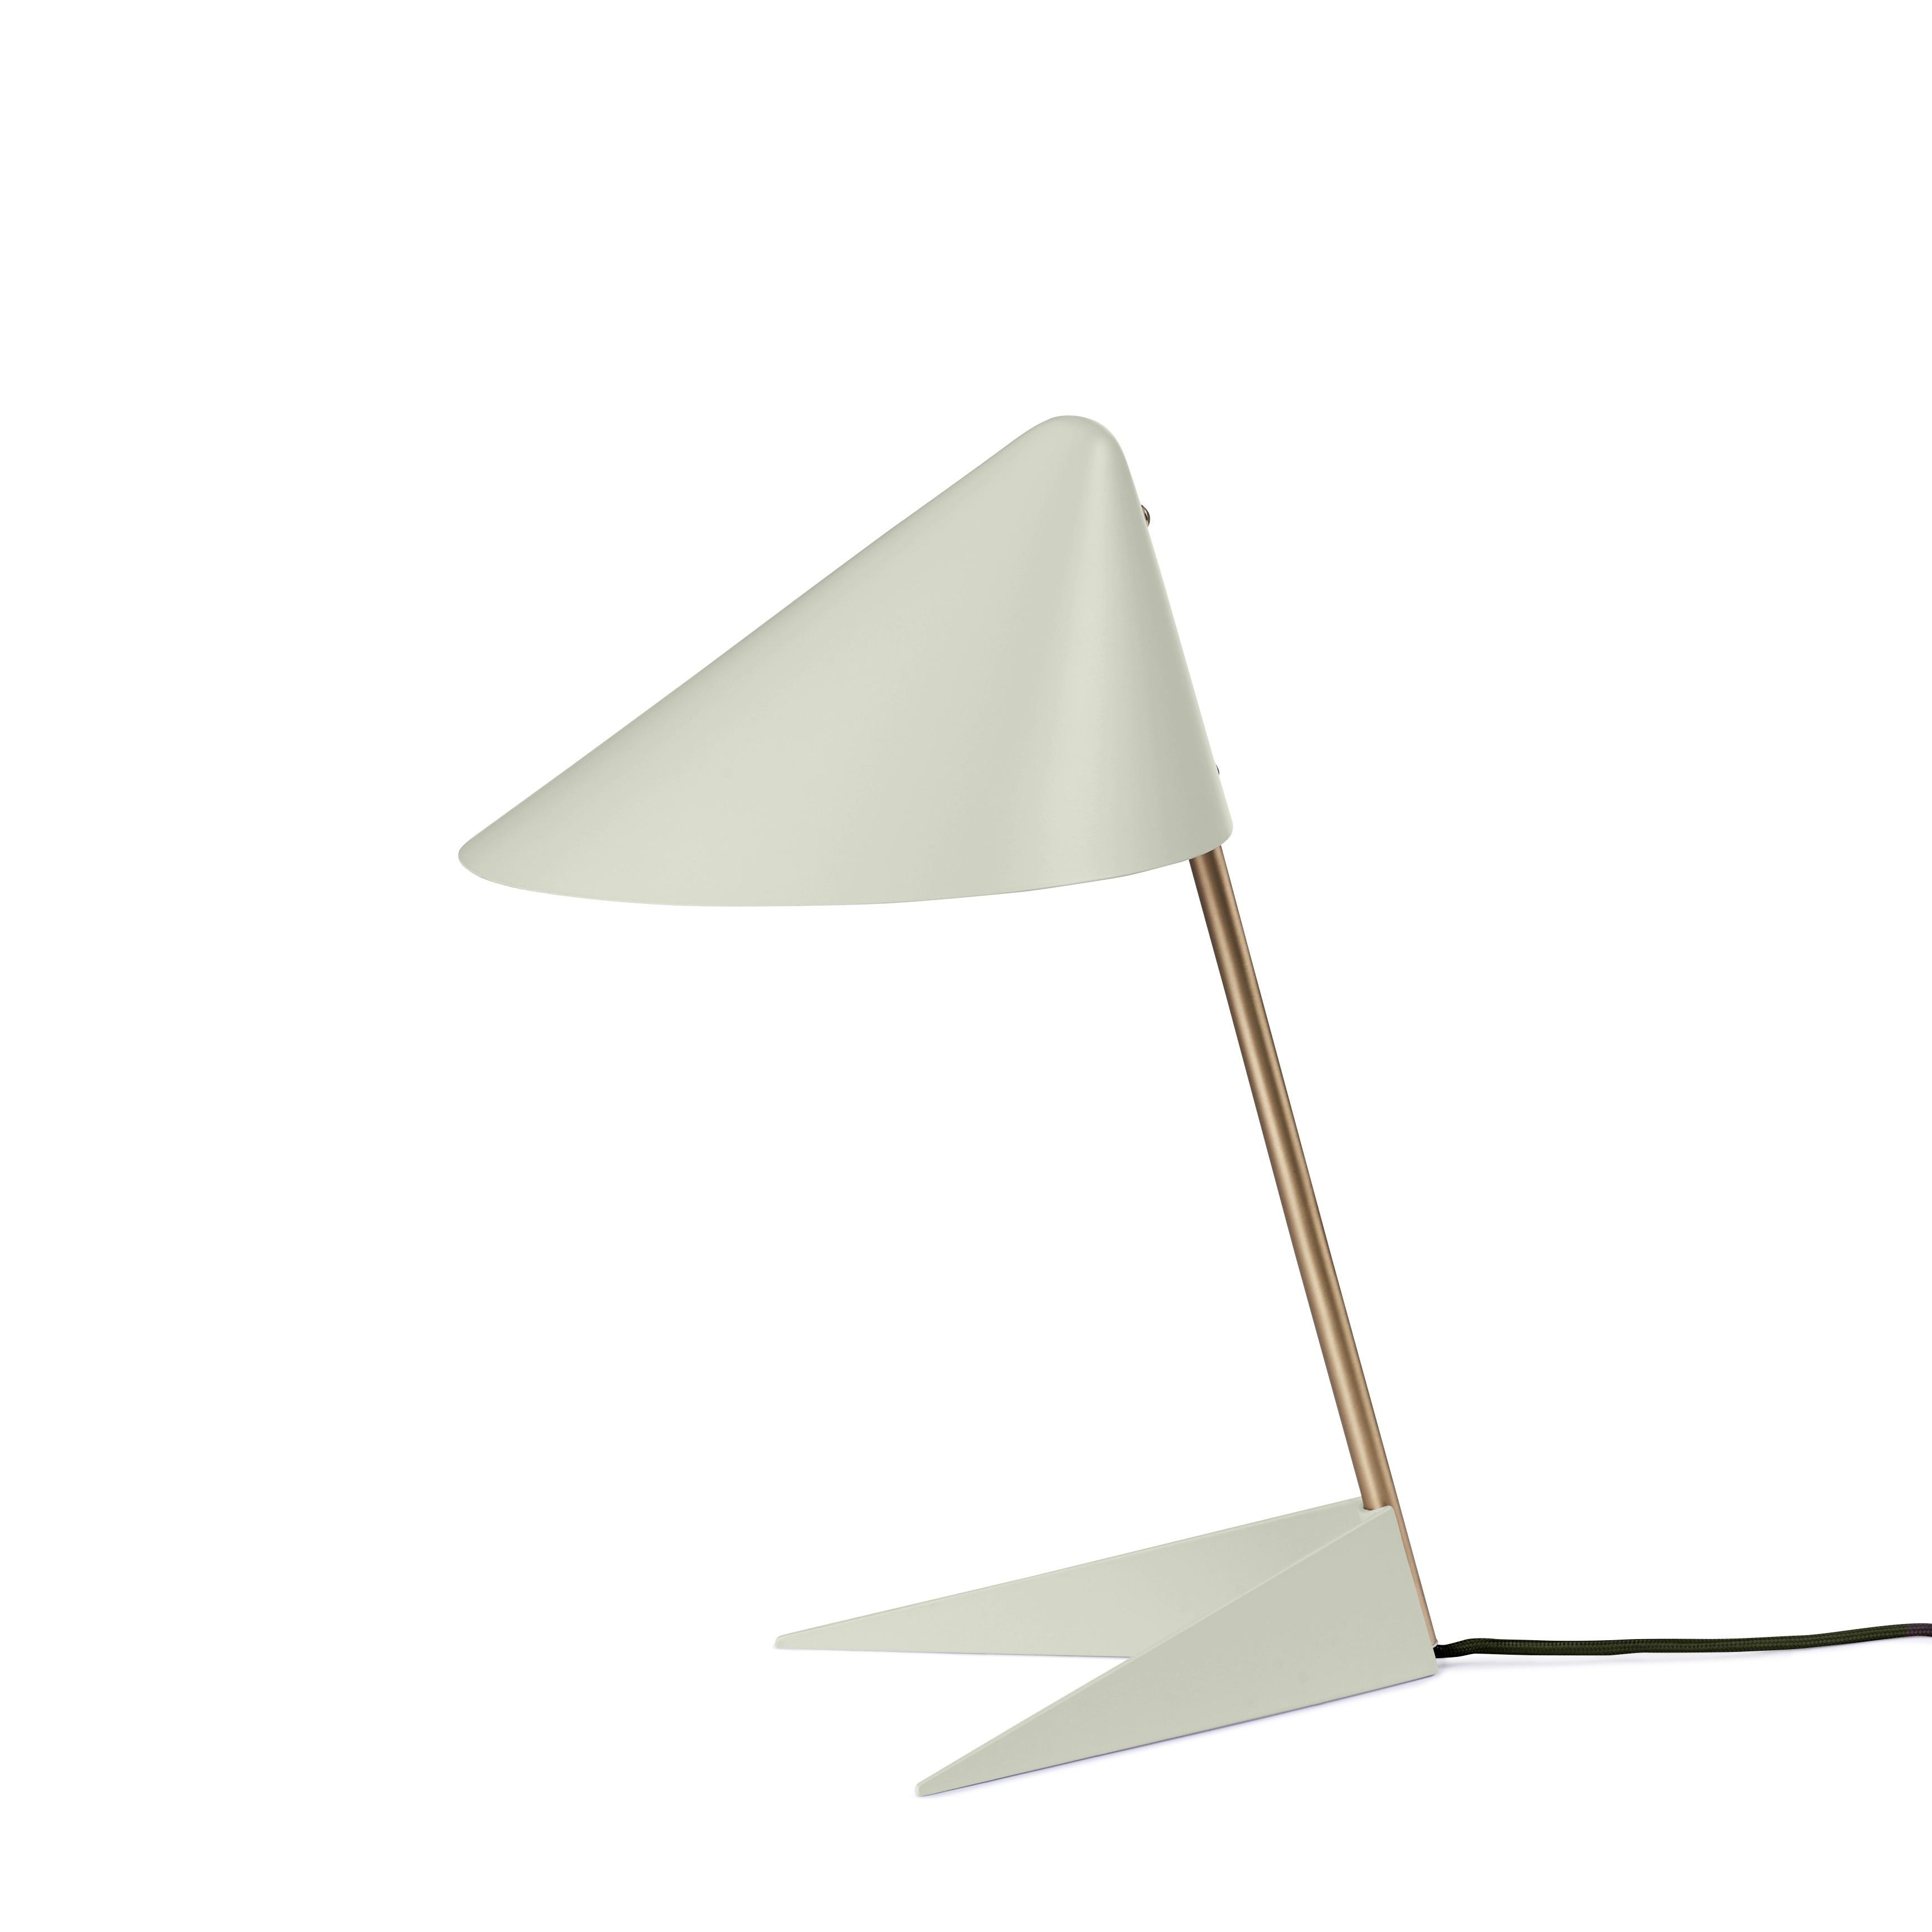 Ambience bordslampa warm white/brass